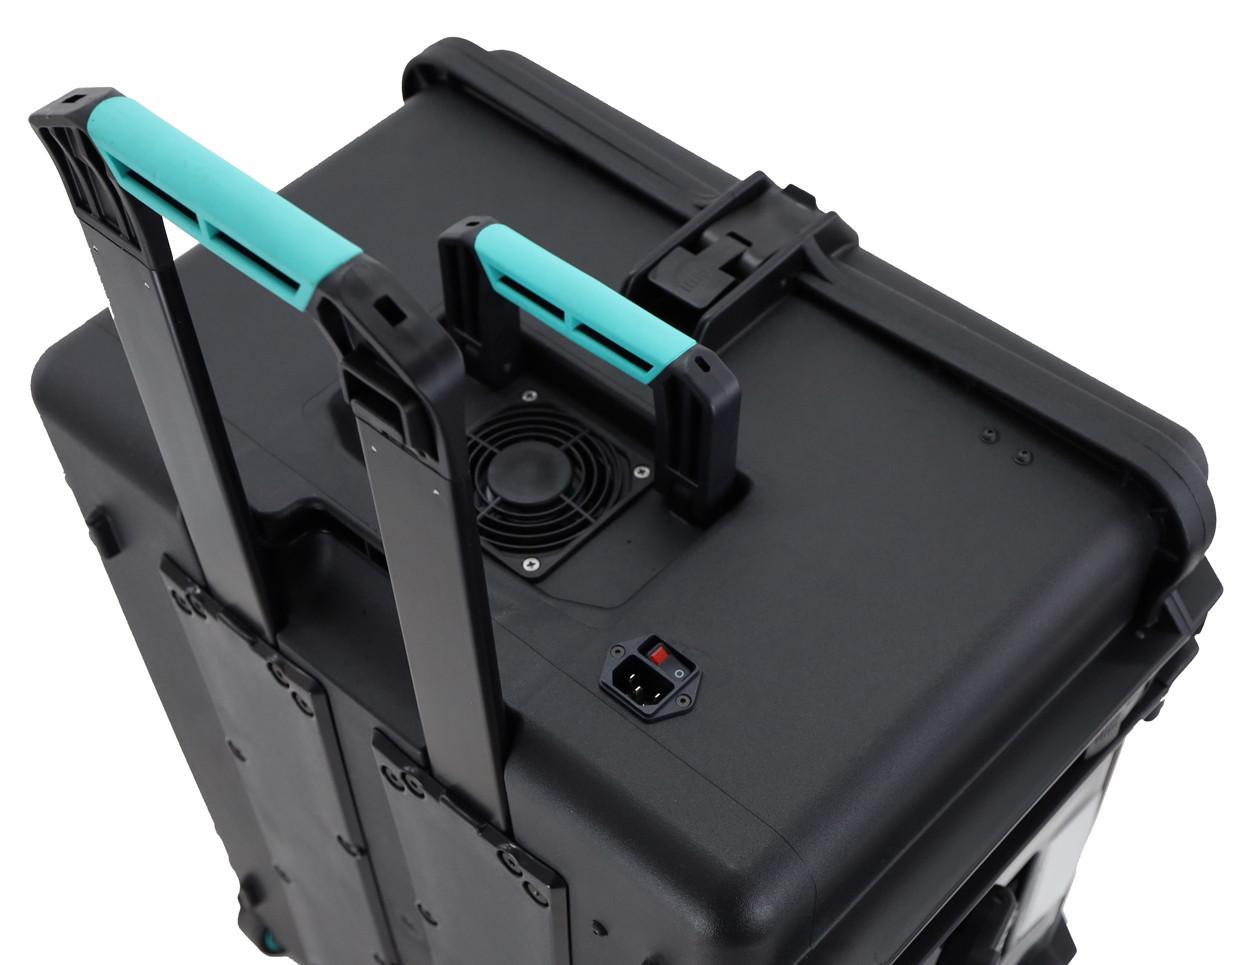 Tabletkoffer_TransformerCase-T16MC-3.jpg